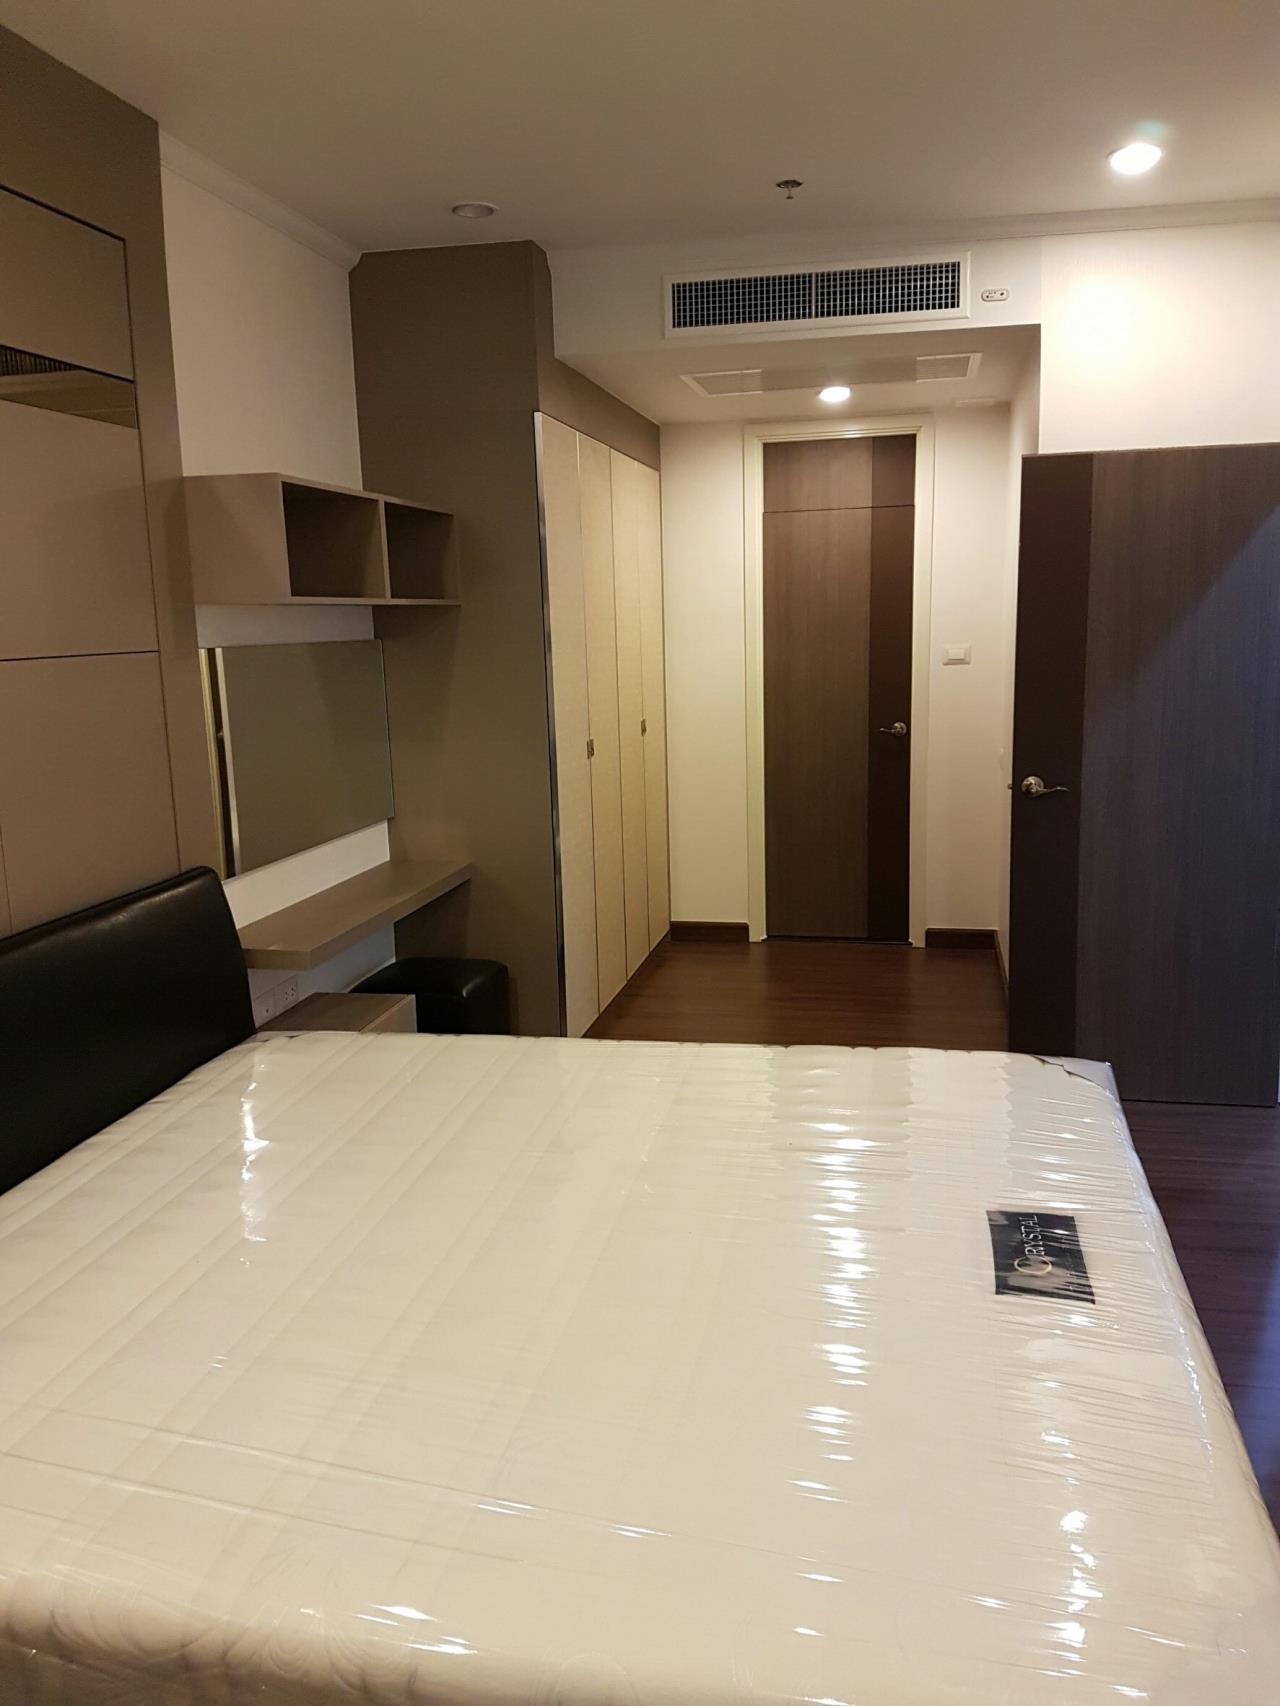 Quality Life Property Agency's supalai elite sathorn-suanplu [ FOR RENT / SALE] 5